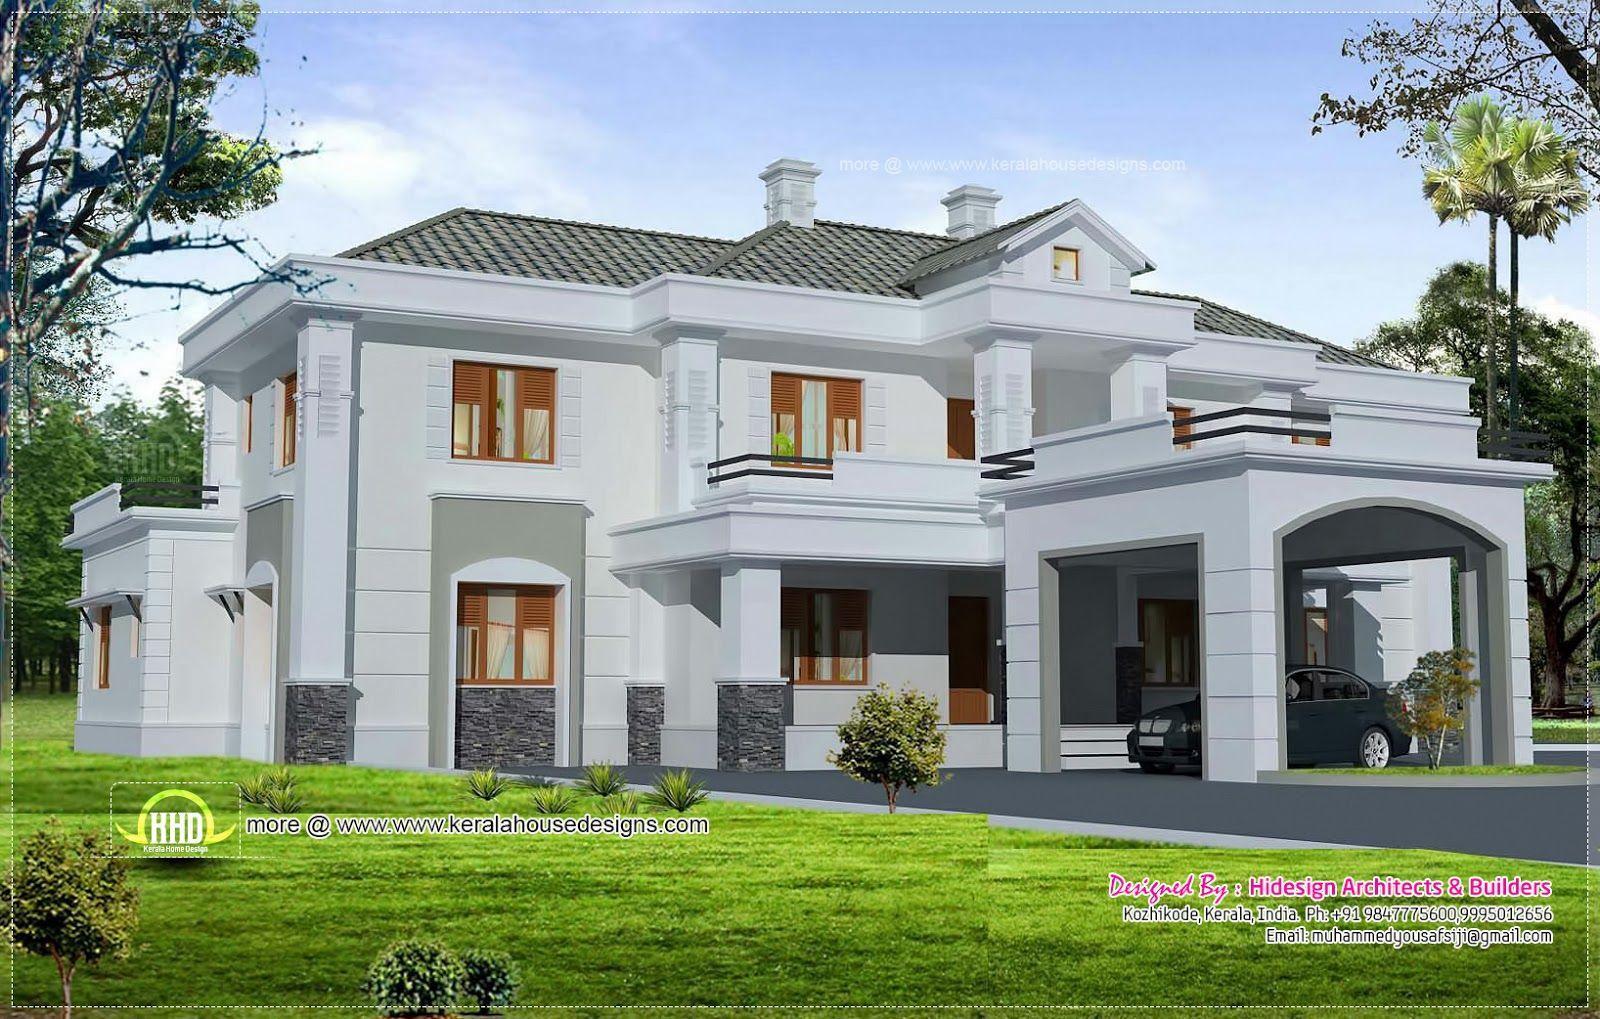 I Enjoy This Mediterranean House Plans Mediterranean House Designs Mediterranean Style House Plans